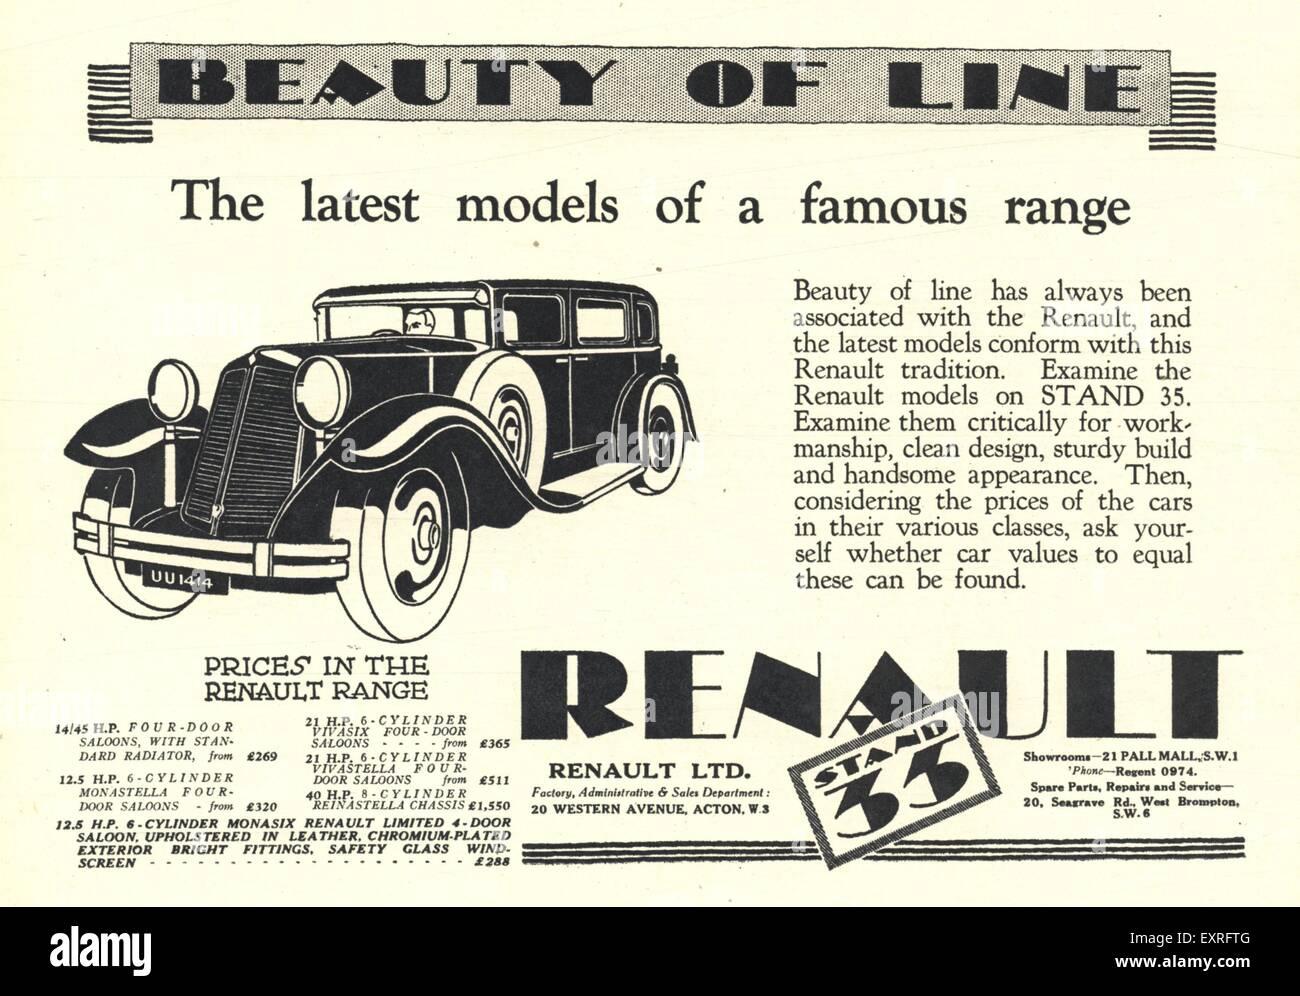 1920s UK Renault Magazine Advert Stock Photo: 85339872 - Alamy